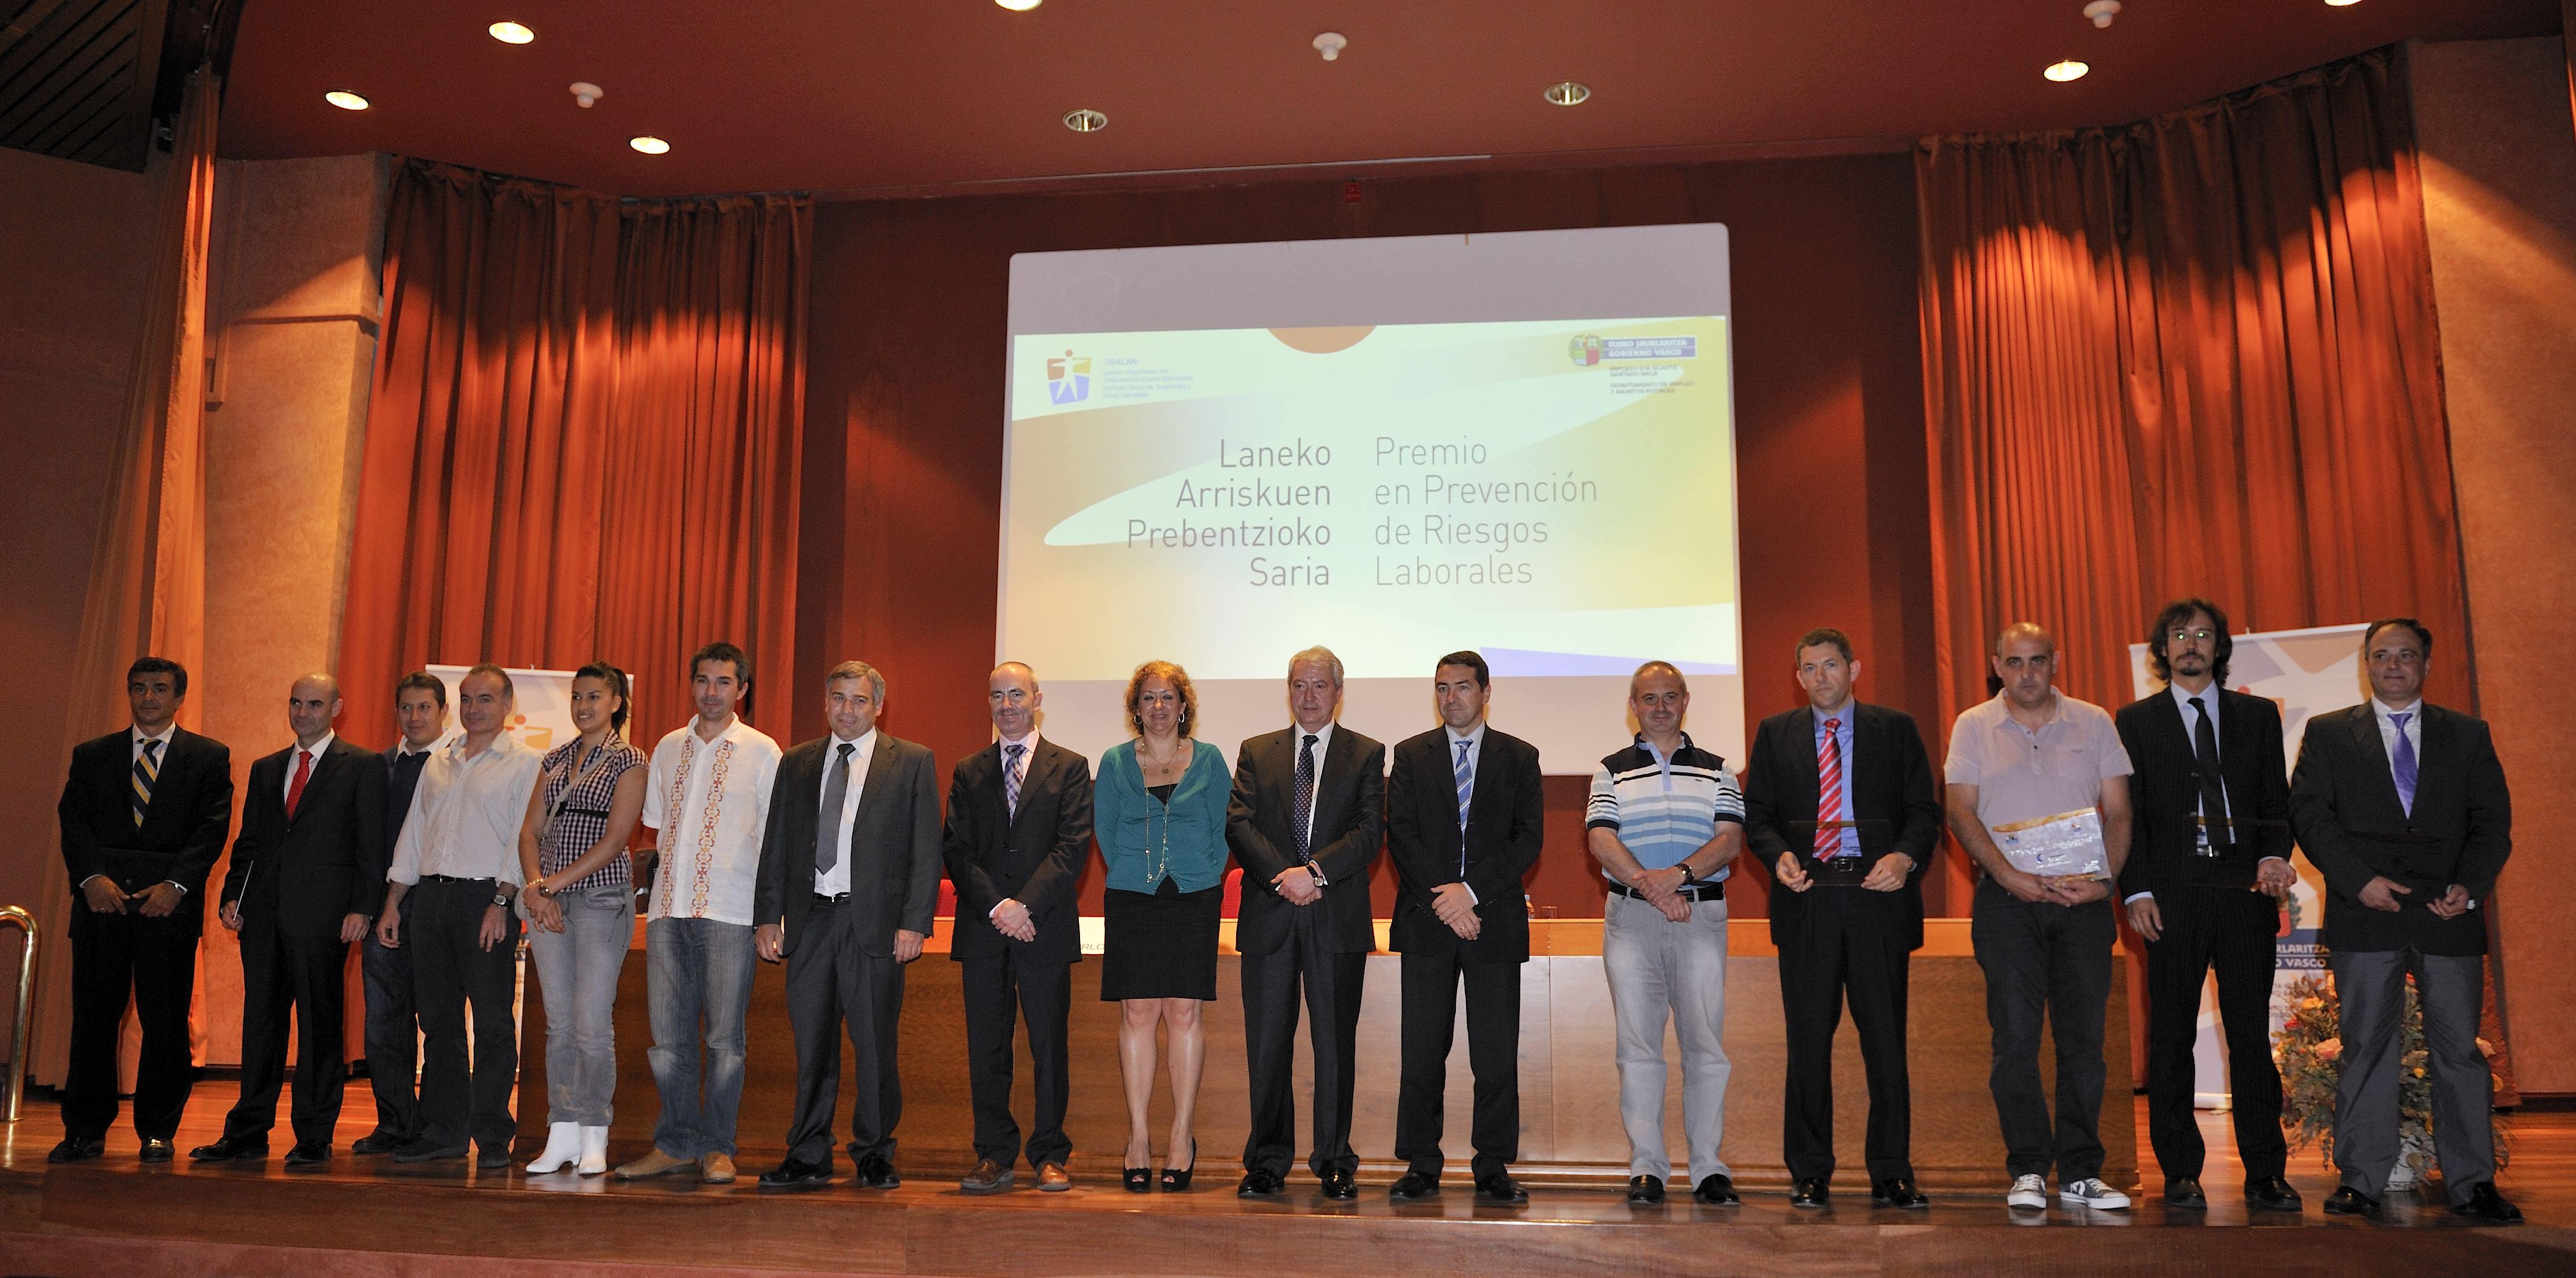 premios_osalan6.jpg